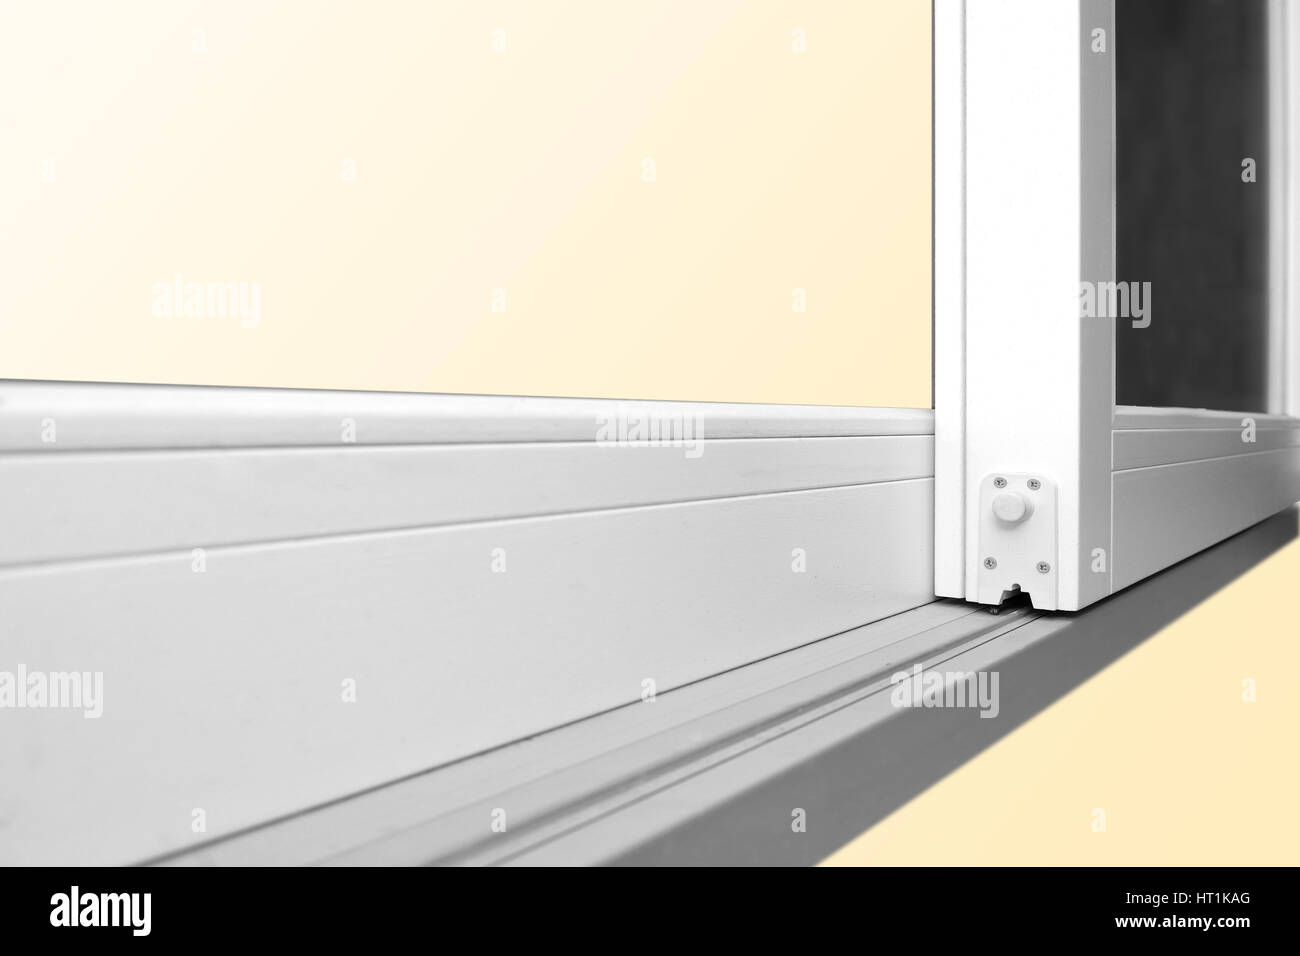 Sliding Glass Door Detail And Rail Embed In Wooden Floor